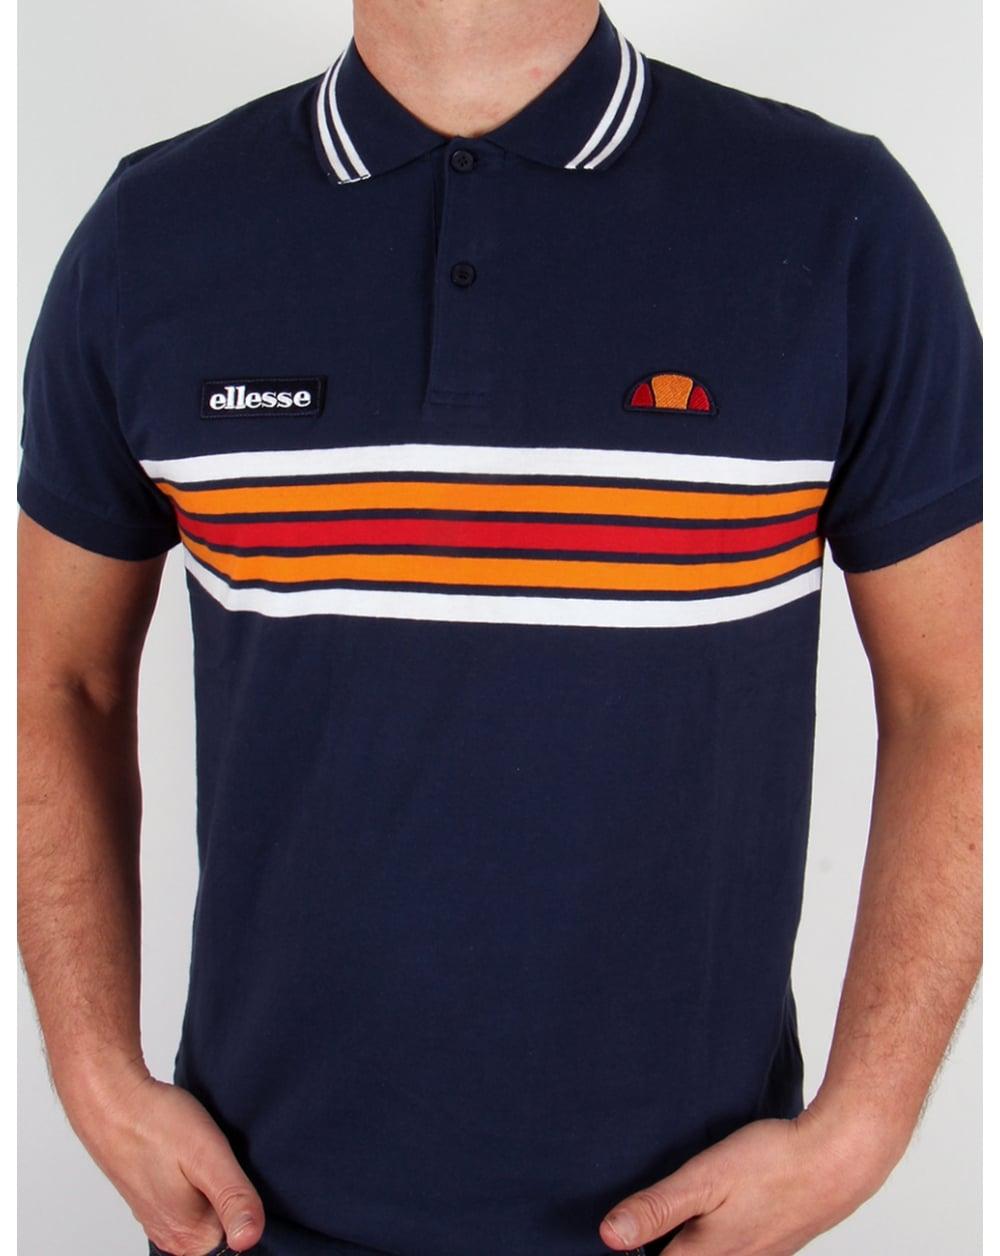 1d88b51369c Ellesse Elite Striped Polo Shirt Navy - heritage striped polo